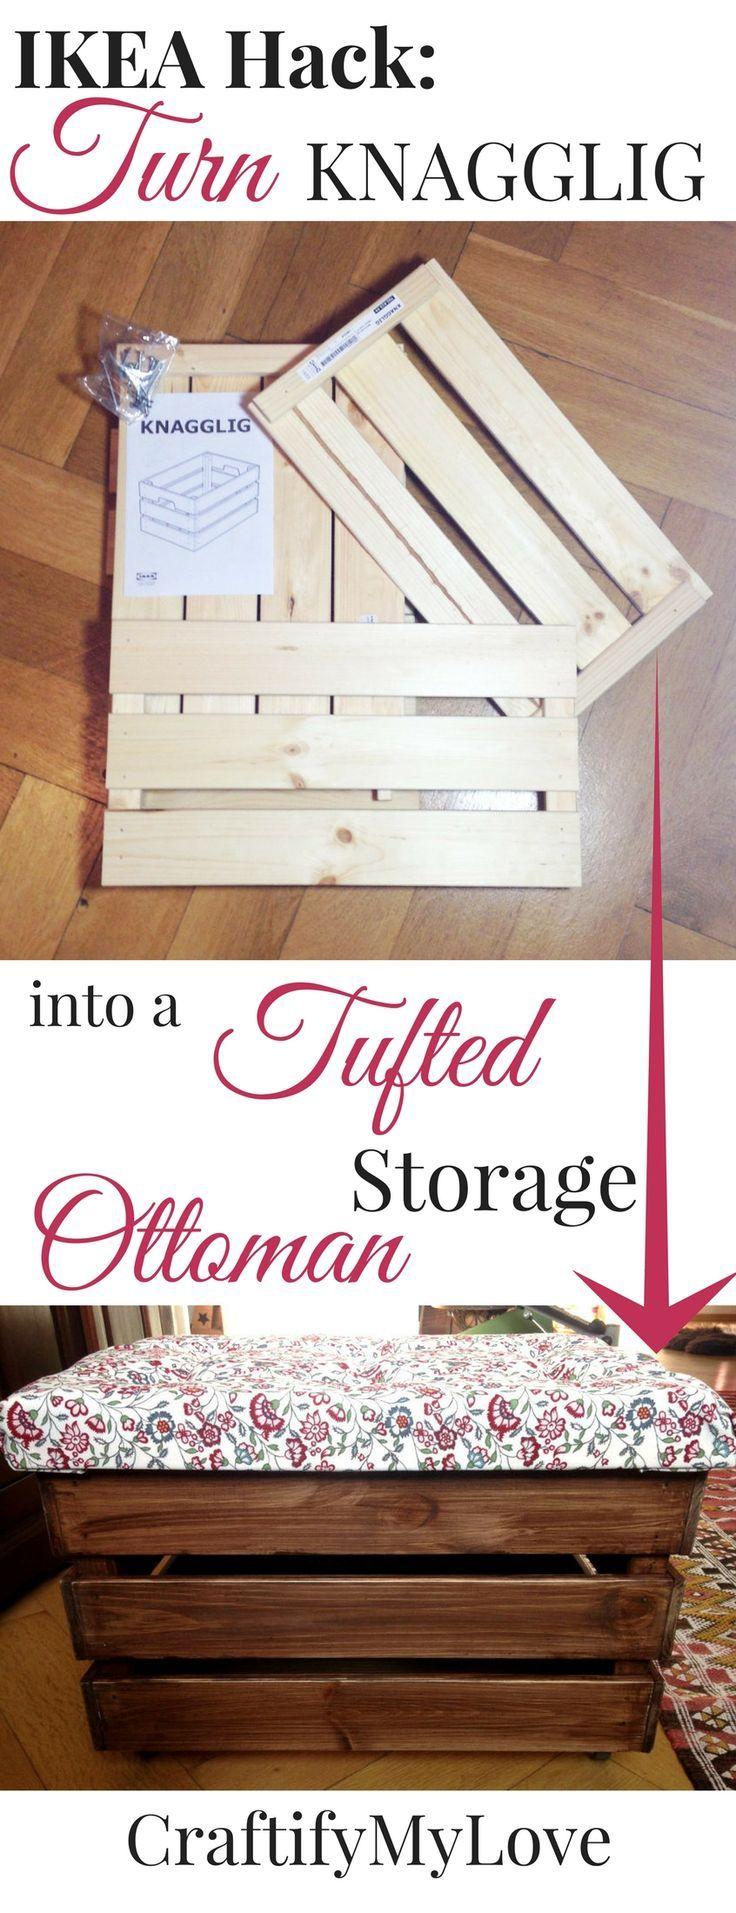 IKEA Hack – Tufted Storage Ottoman